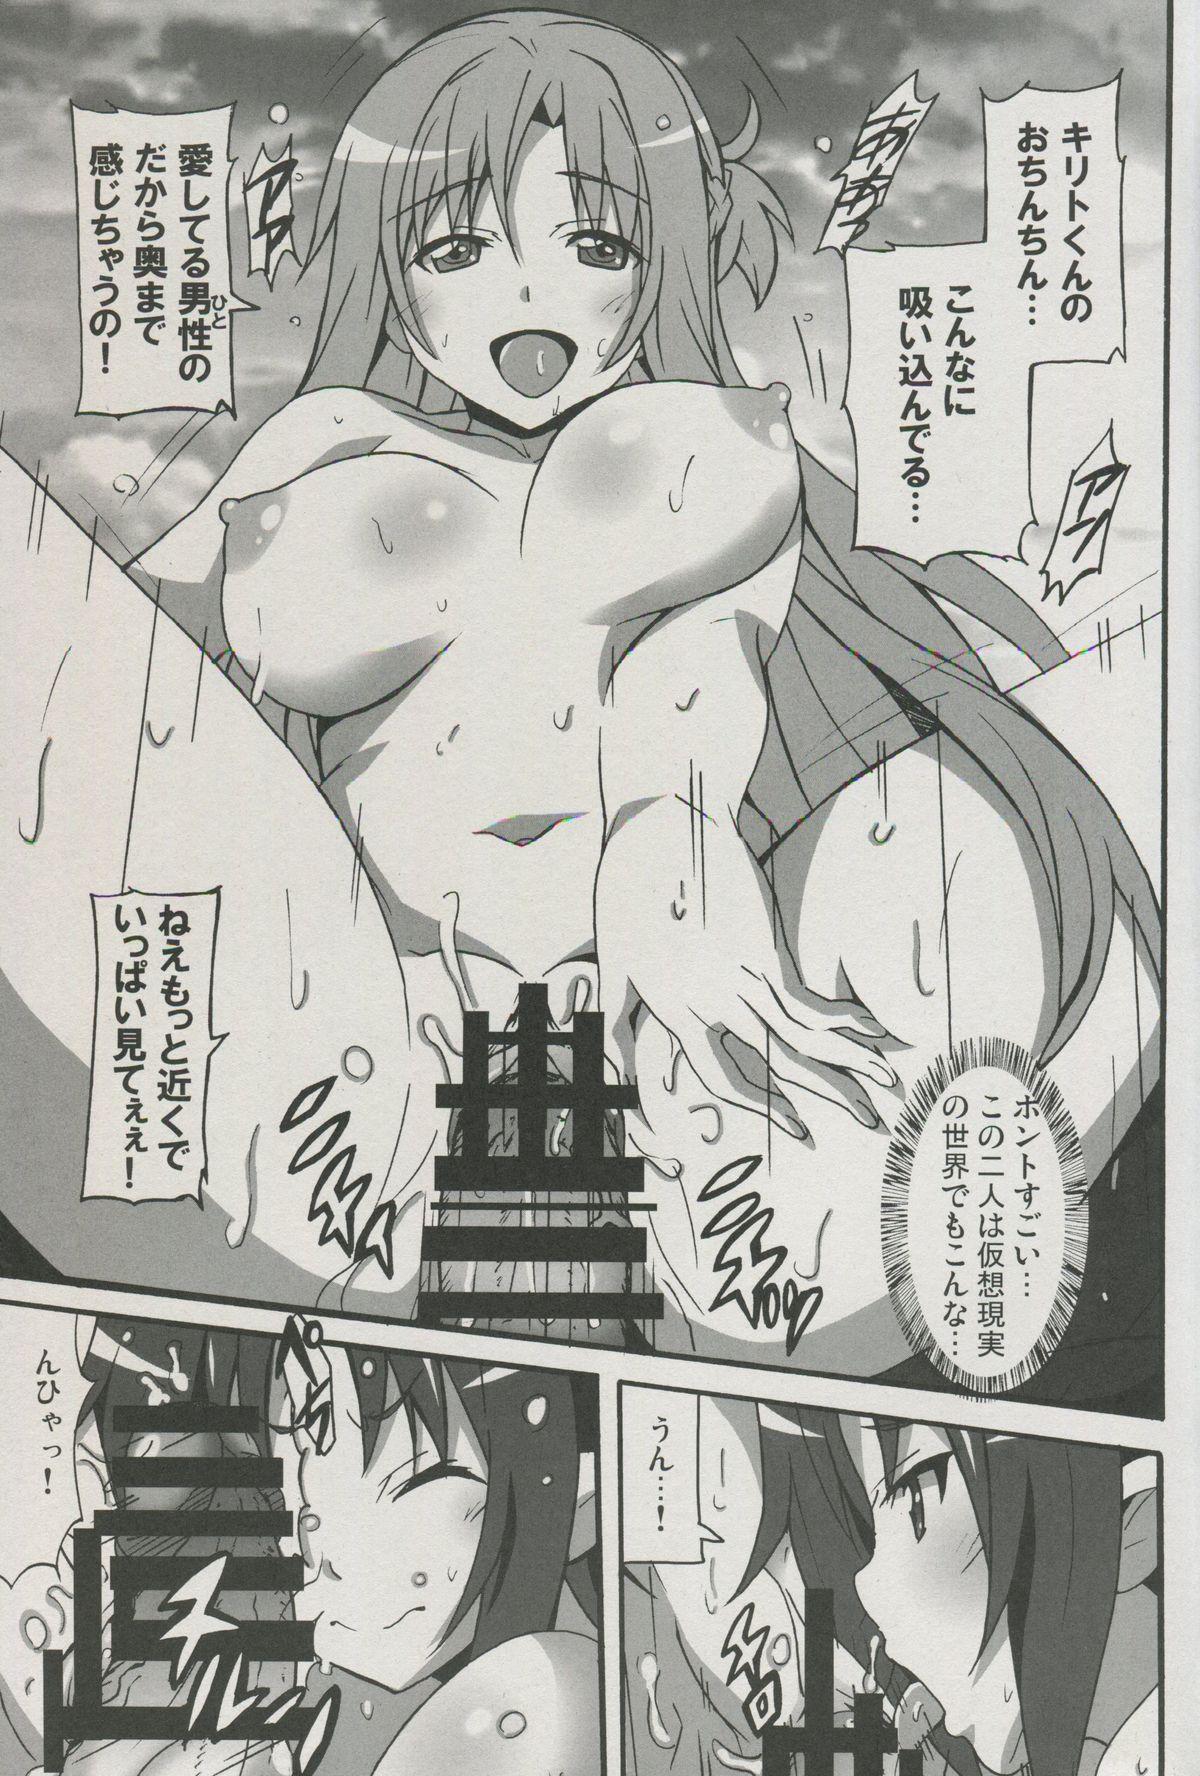 Sword Art Online Hollow Sensual 2 15